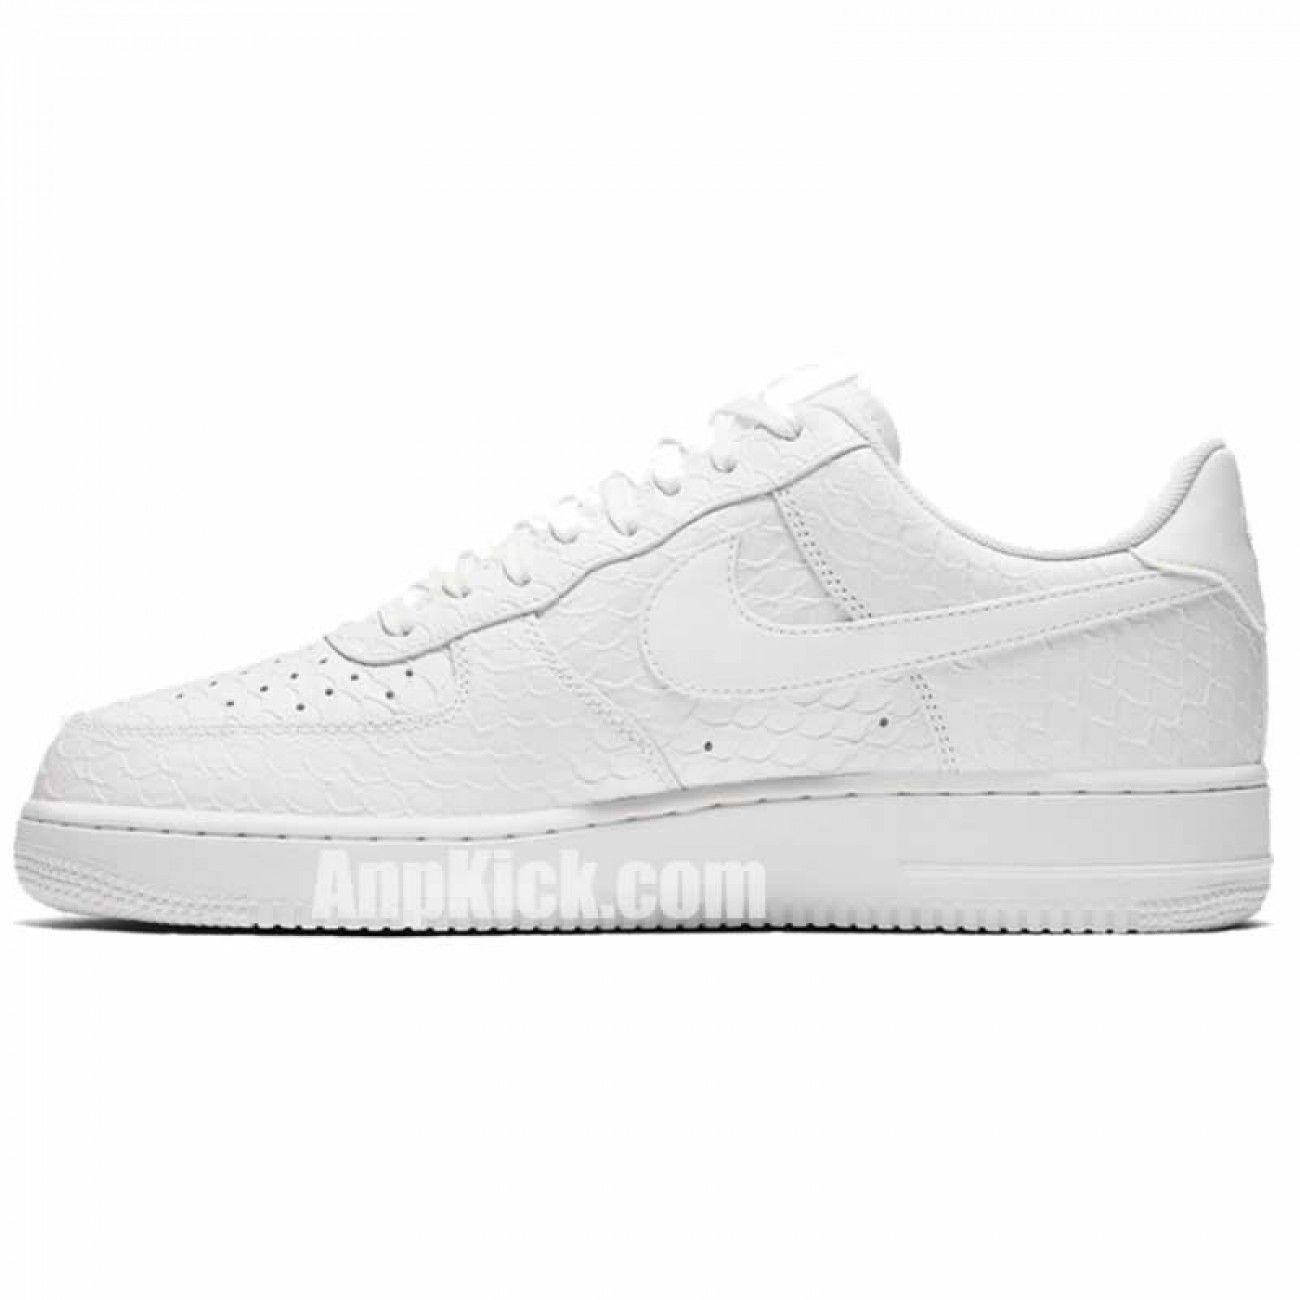 Nike | Nike Air Force 1 '07 Lv8 718152 106 Scarpe da